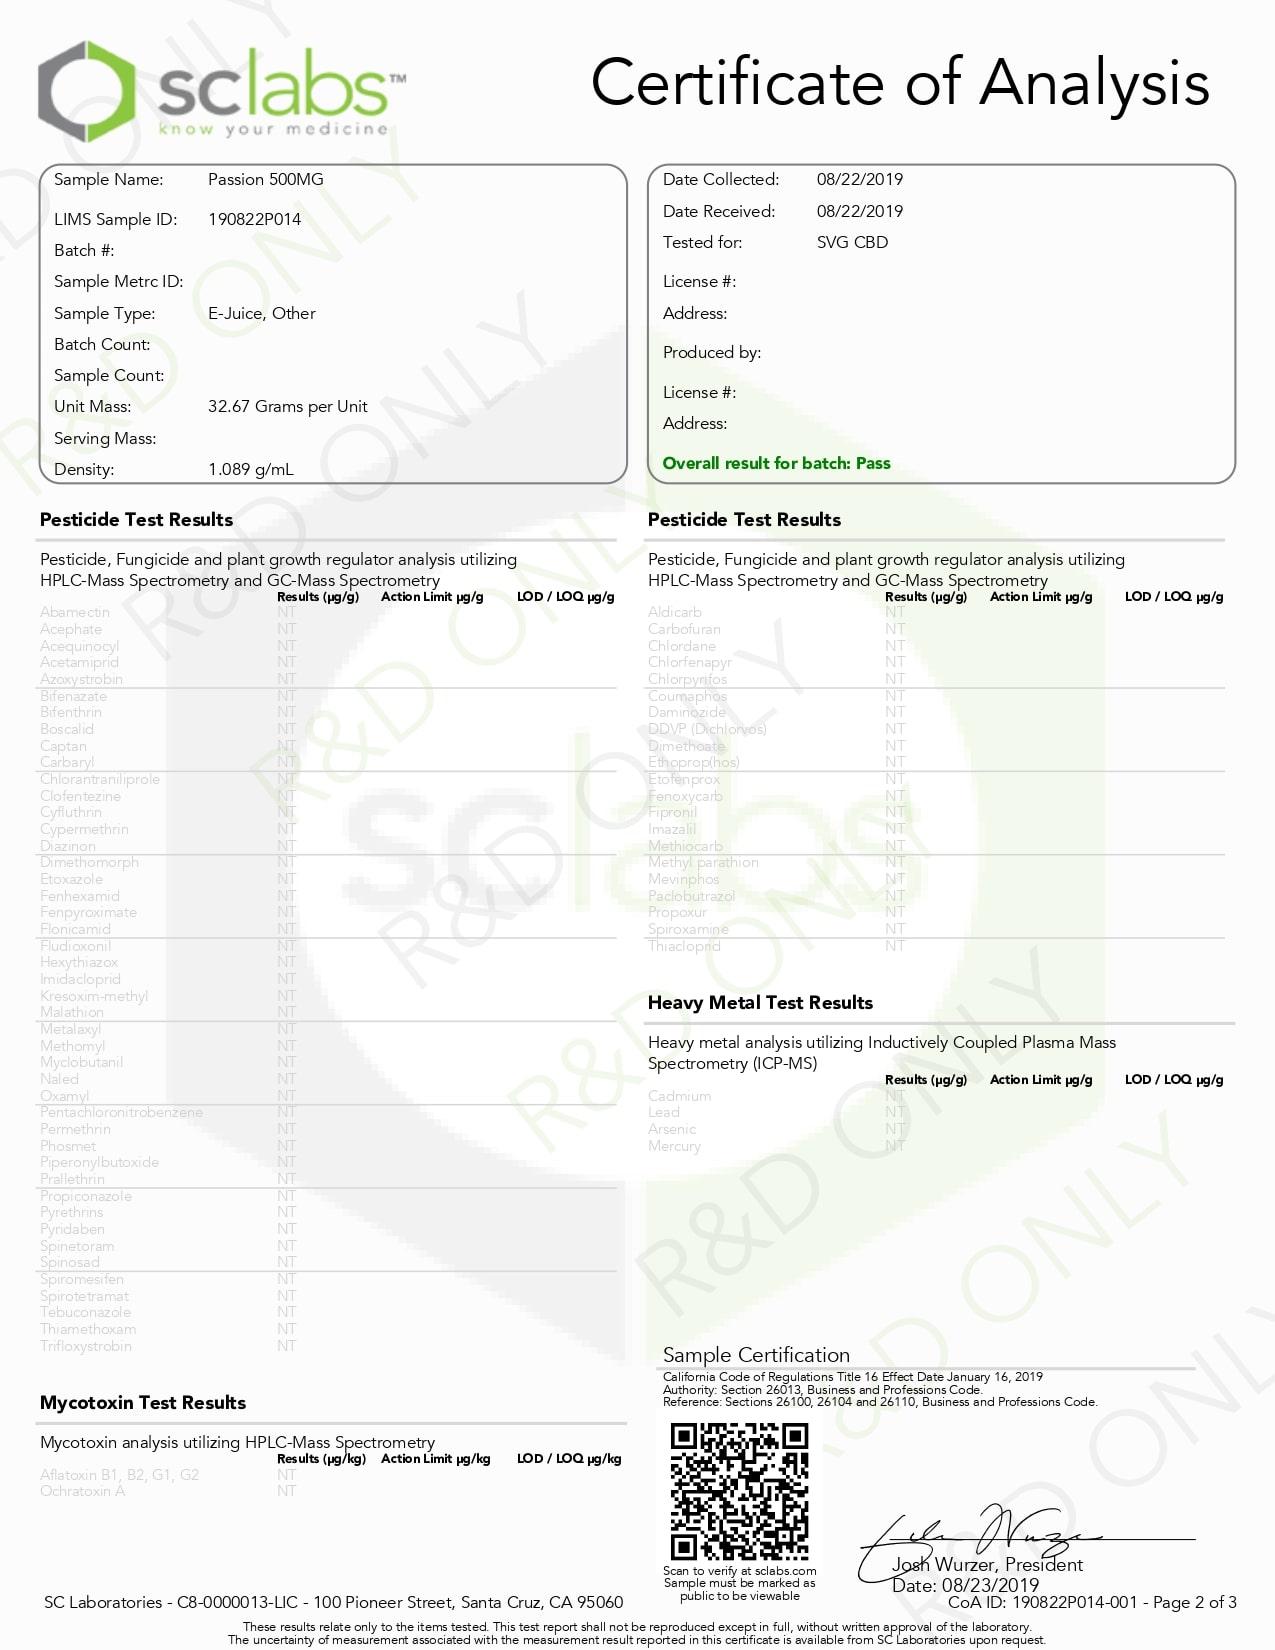 SAVAGE Passion CBD Vape Juice 500mg Lab Report